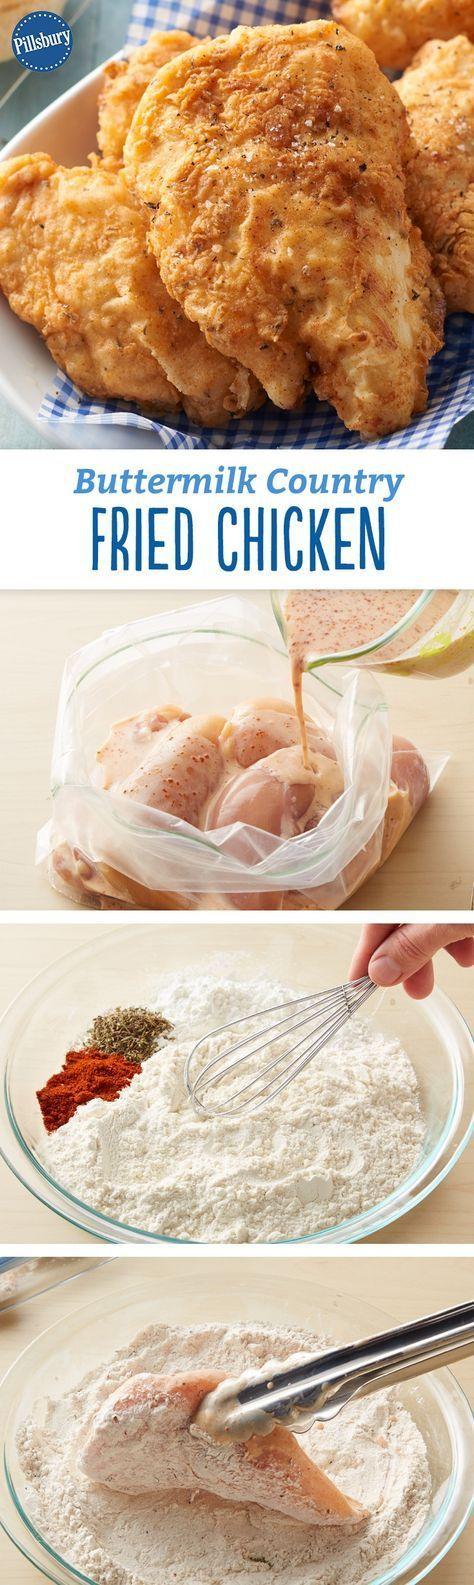 Best 25 chicken recipes ideas on pinterest salsa for Table 52 buttermilk fried chicken recipe